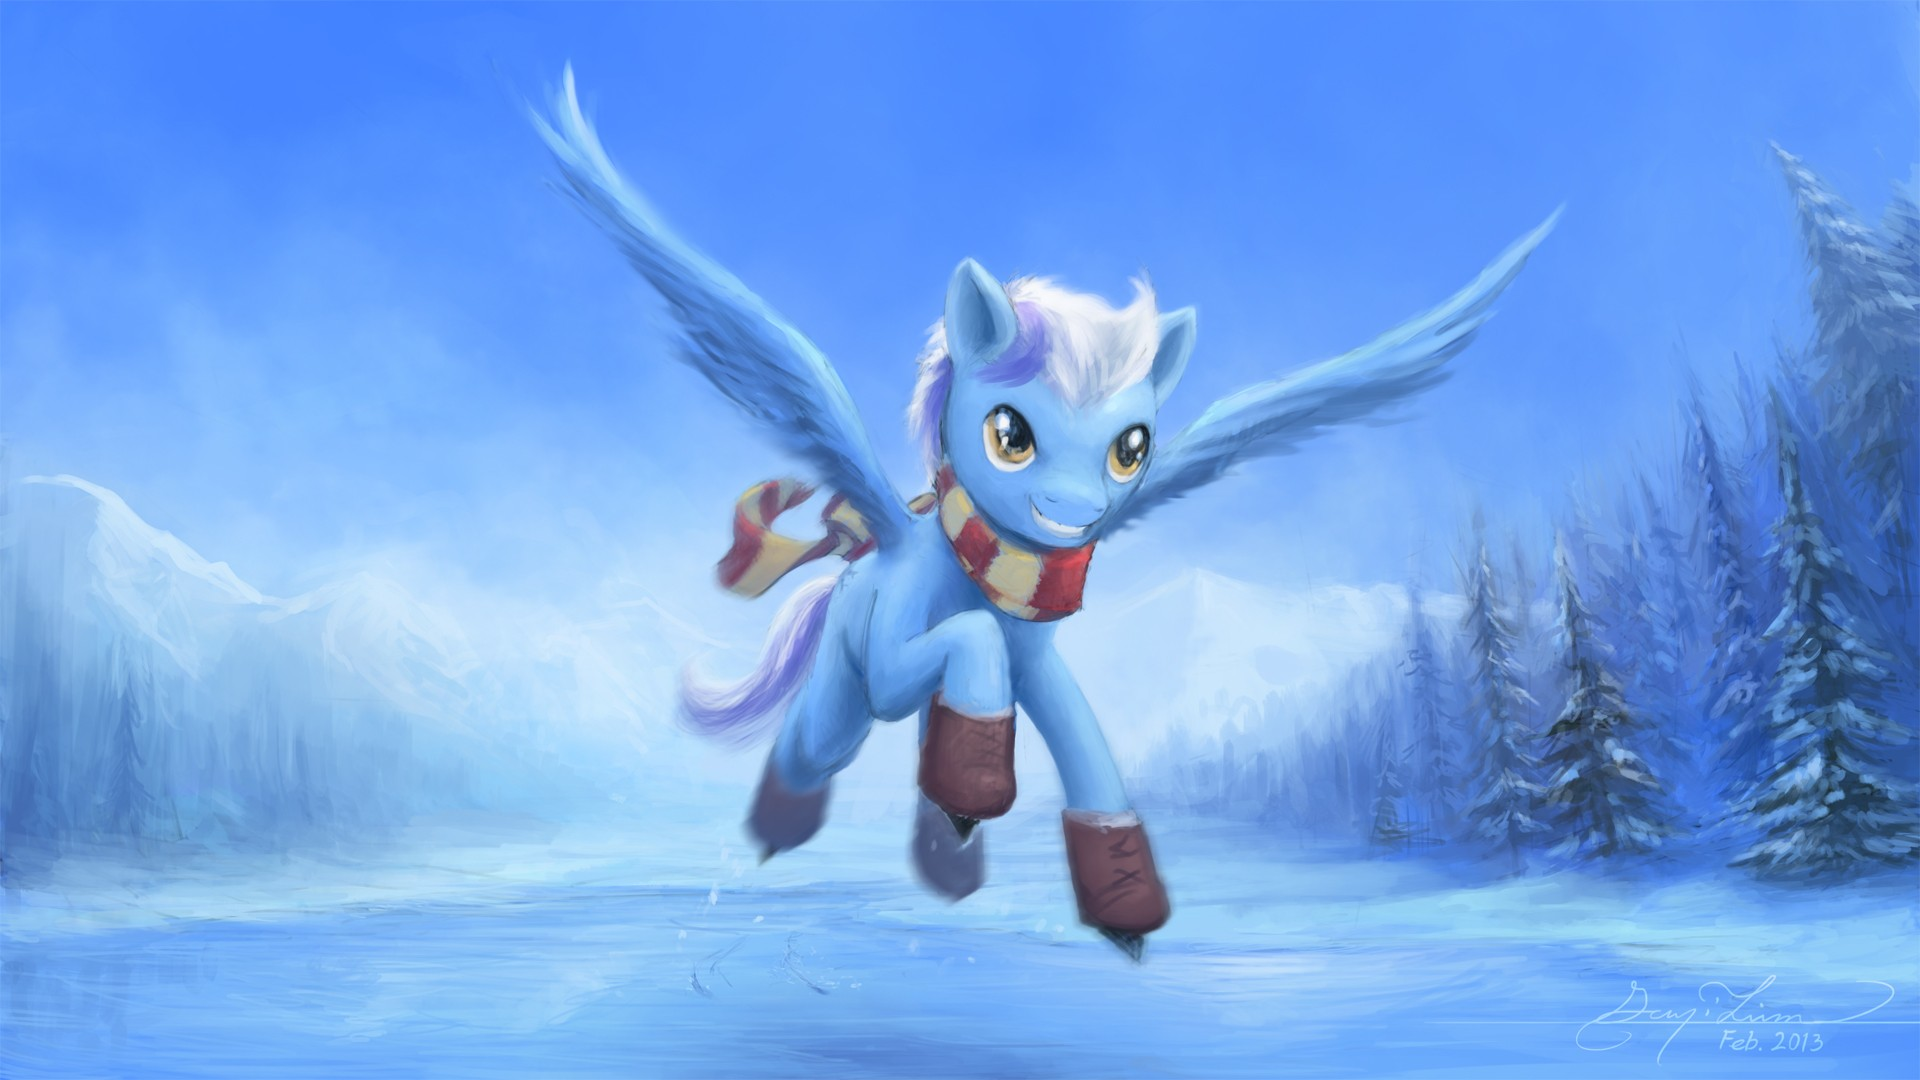 Pony con alas - 1920x1080